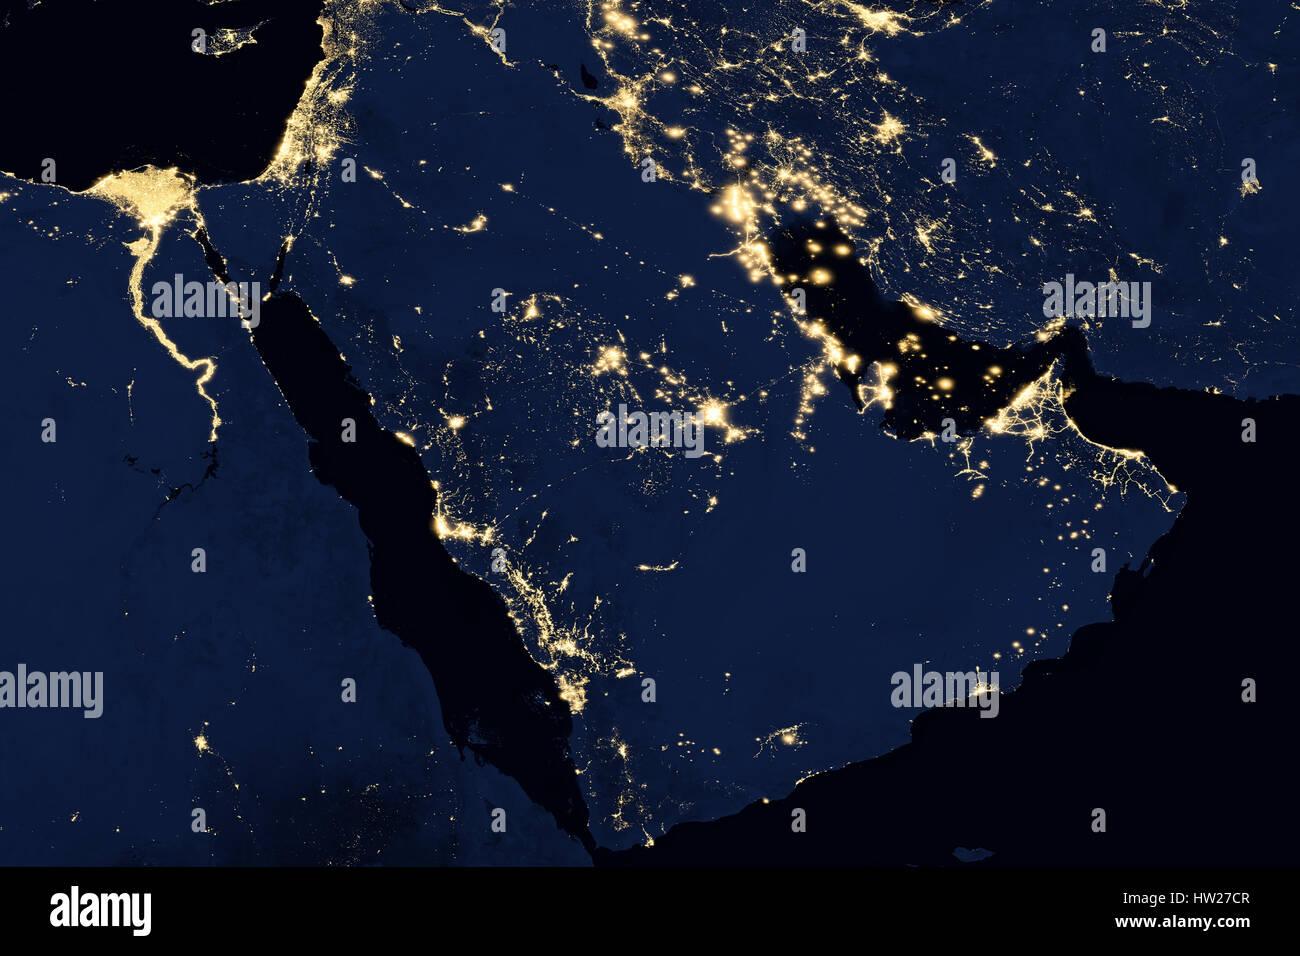 City lights on world map. Arabian Peninsula. - Stock Image